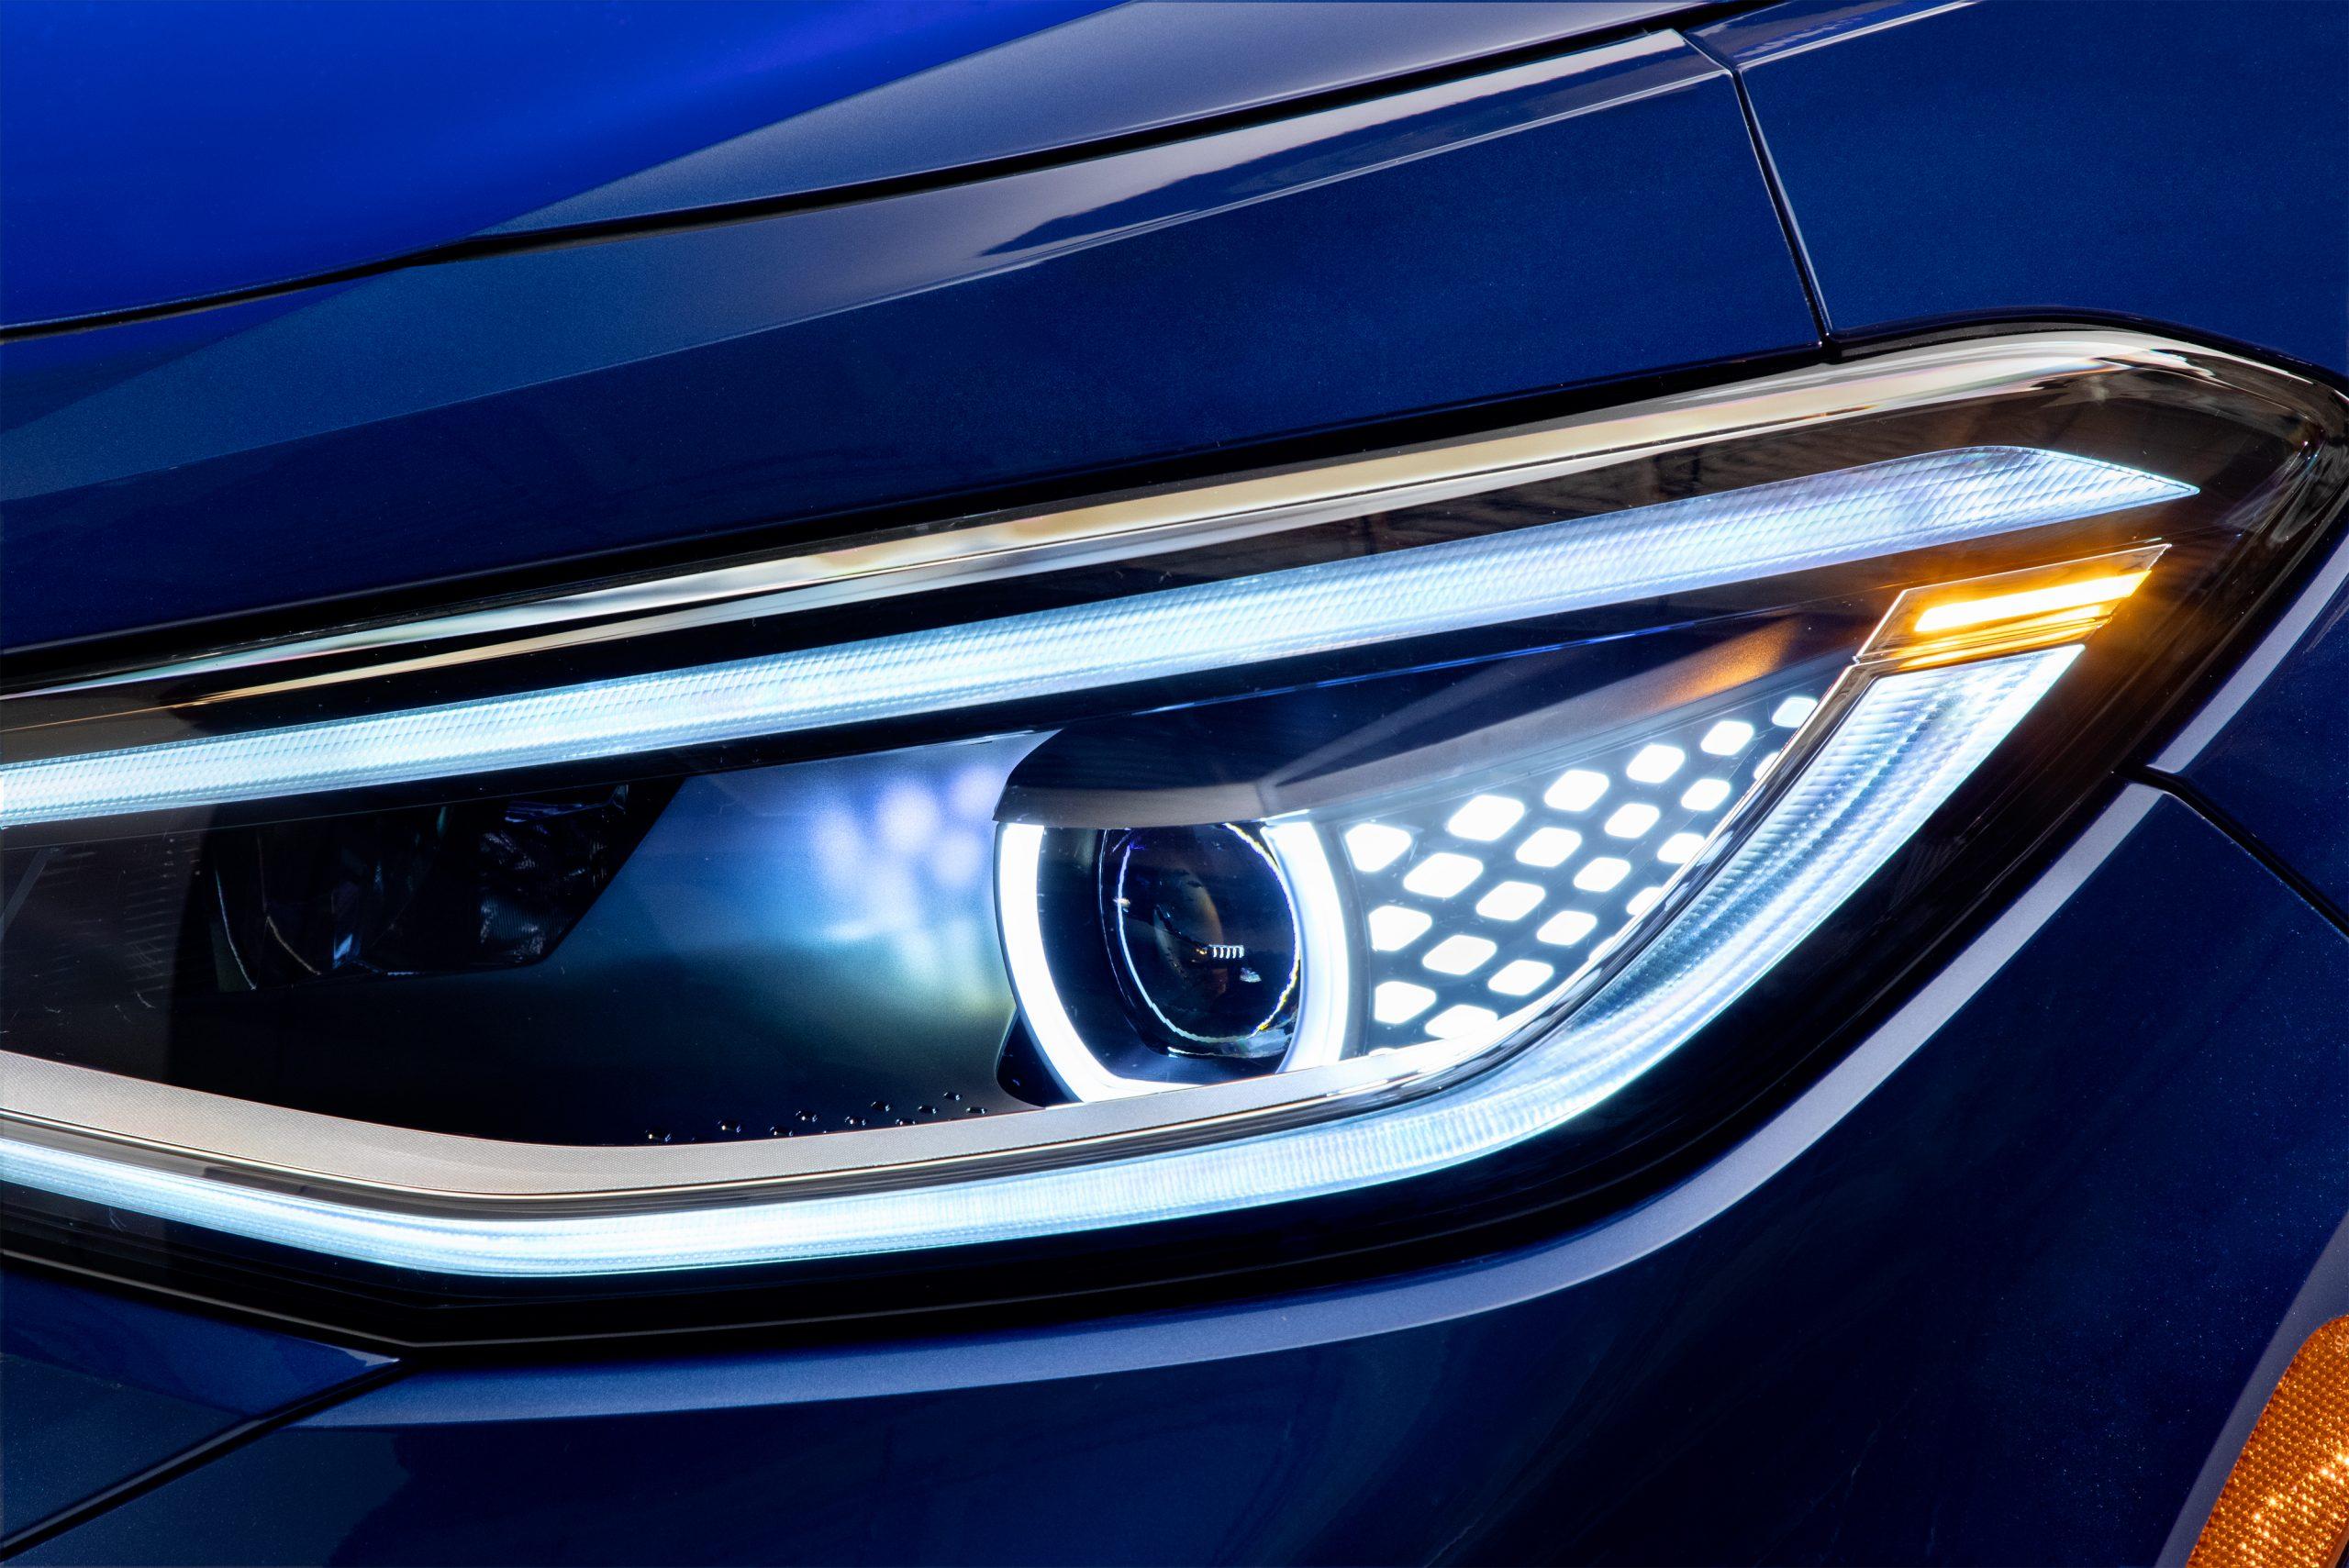 2021 VW ID.4 electric SUV headlight